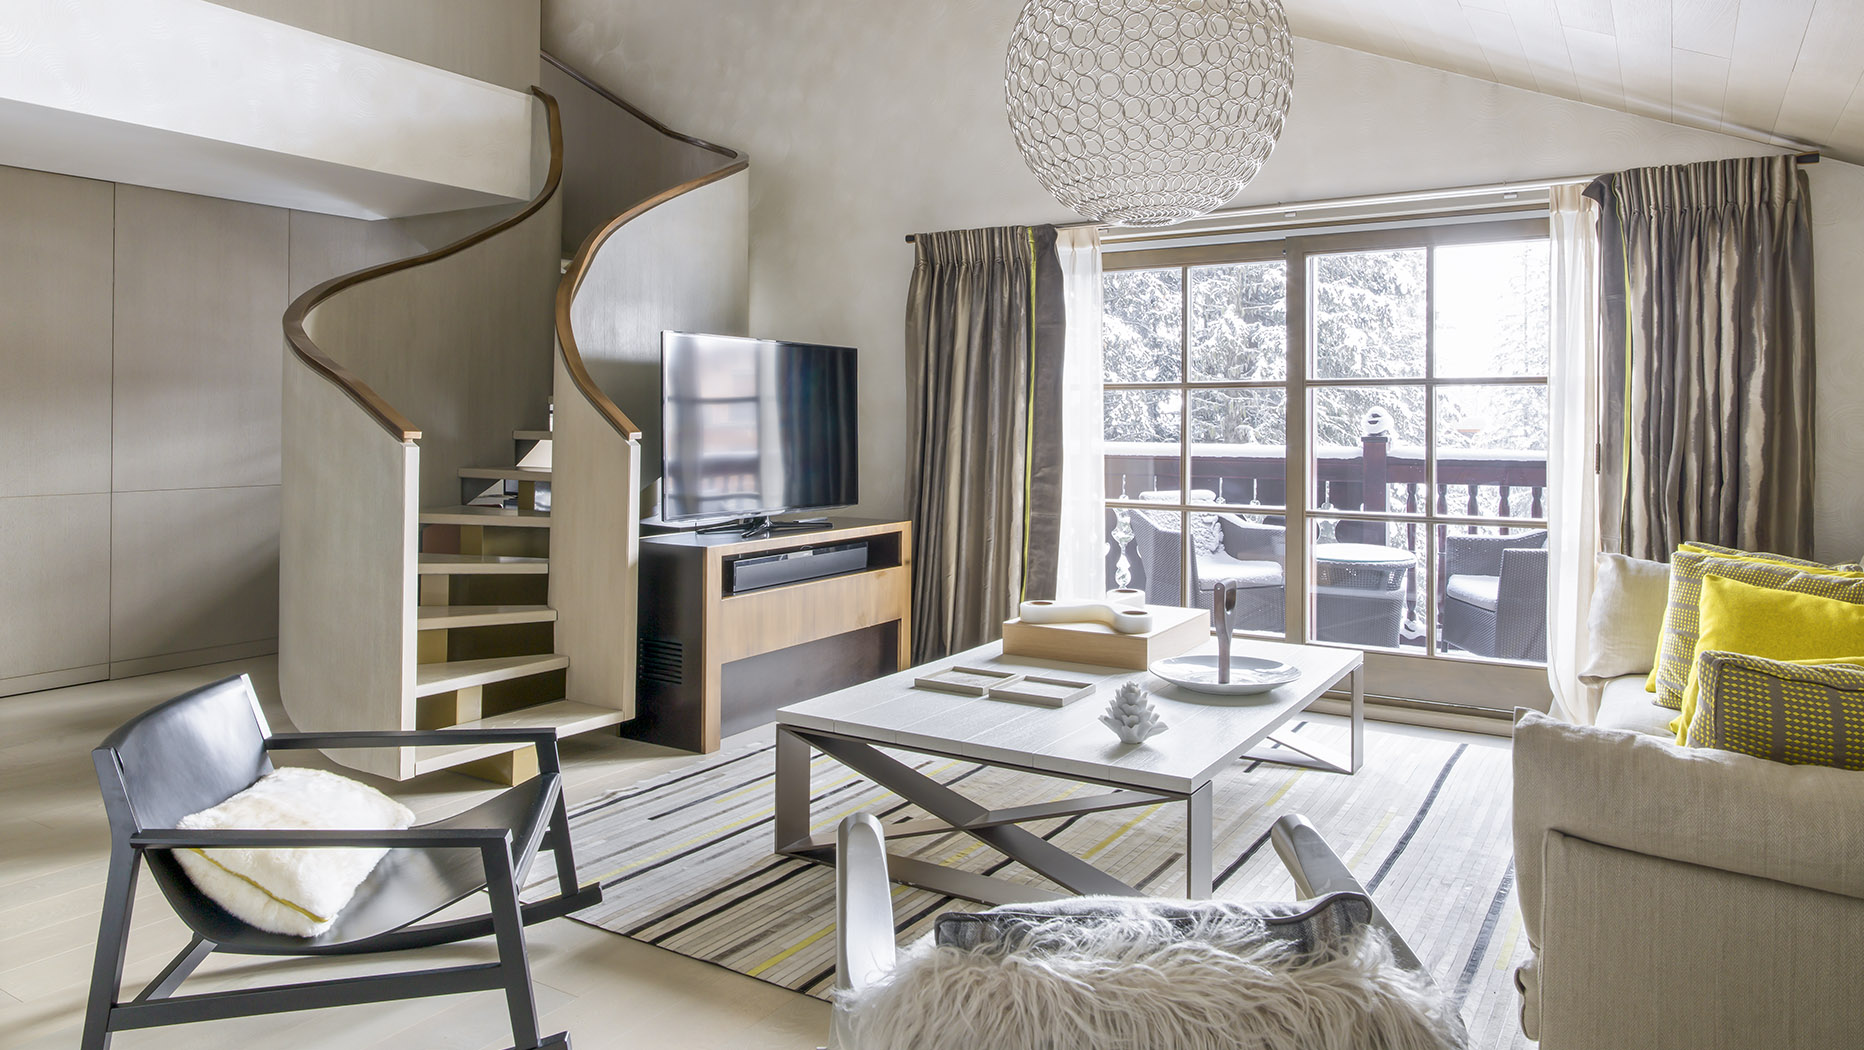 cheval blanc courchevel 1850 french alps casol villas. Black Bedroom Furniture Sets. Home Design Ideas